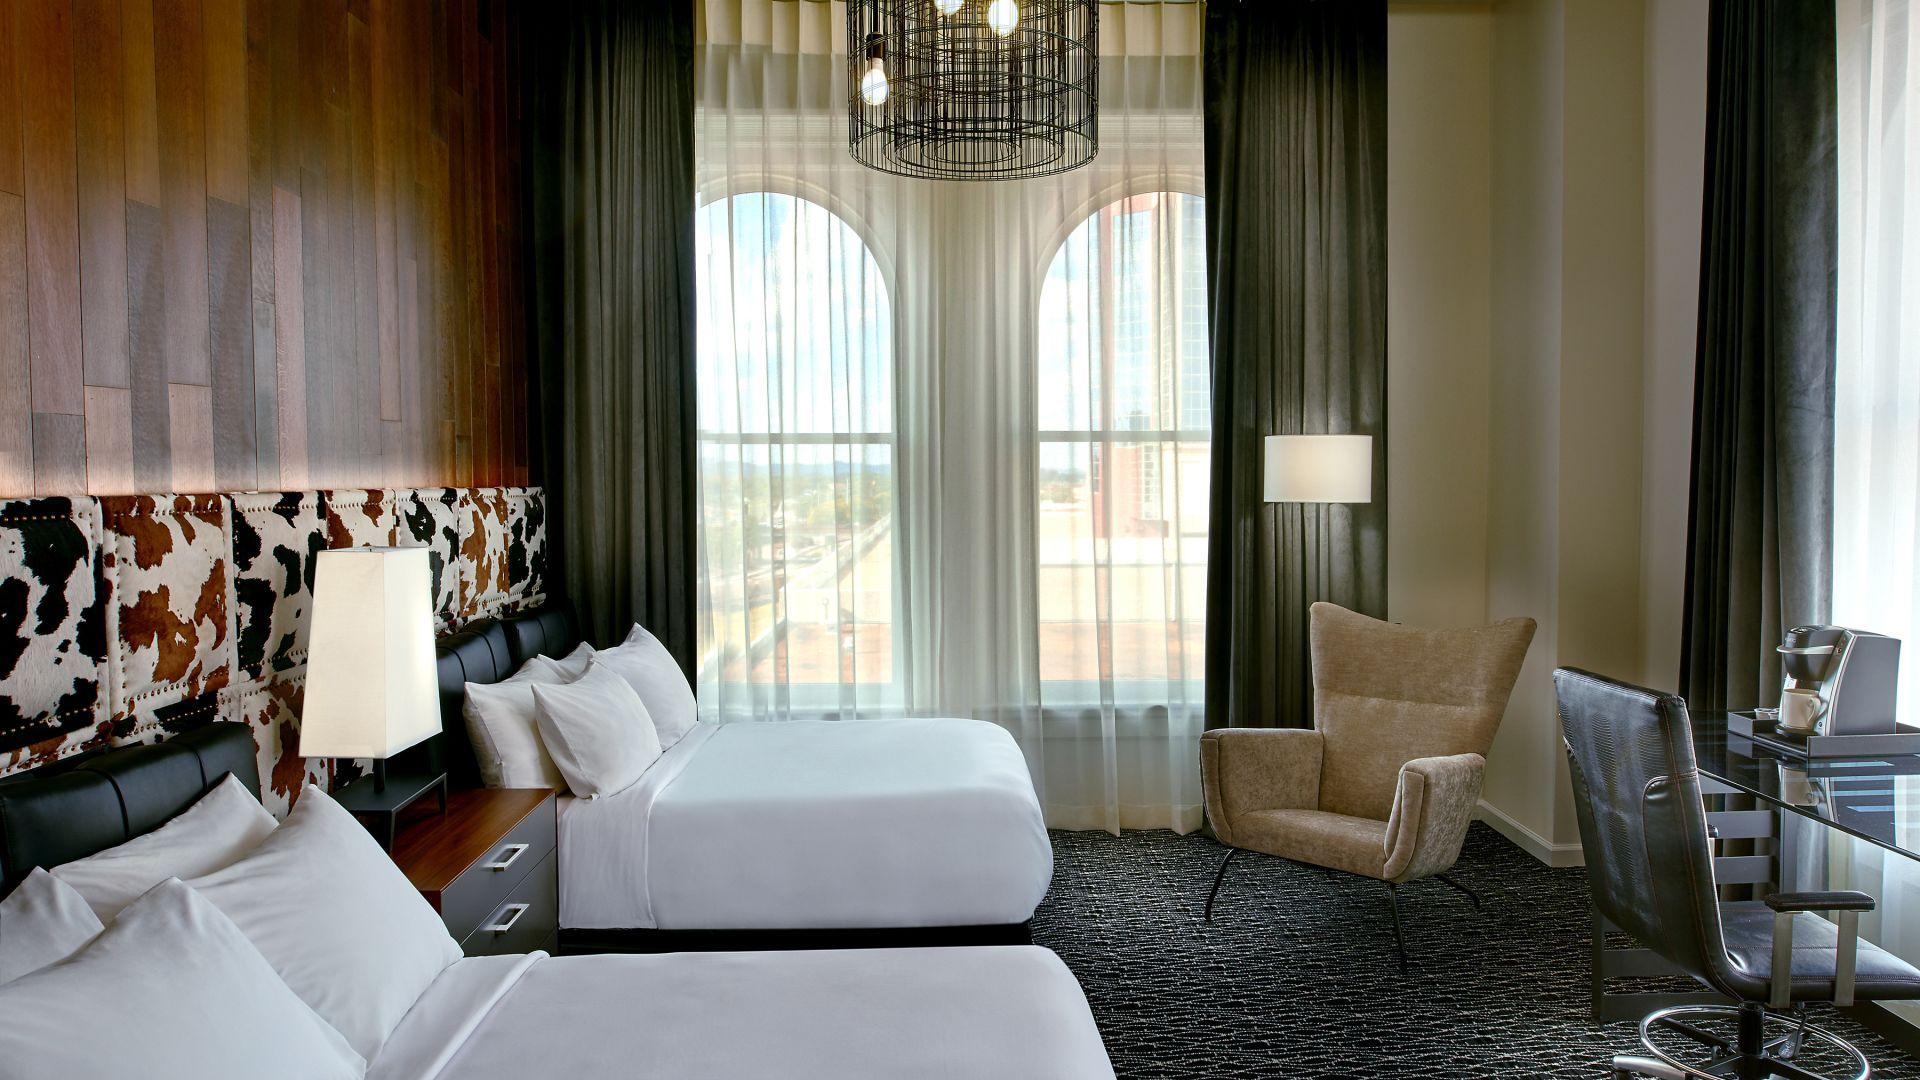 Downtown Nashville Hotel Union Station Hotel